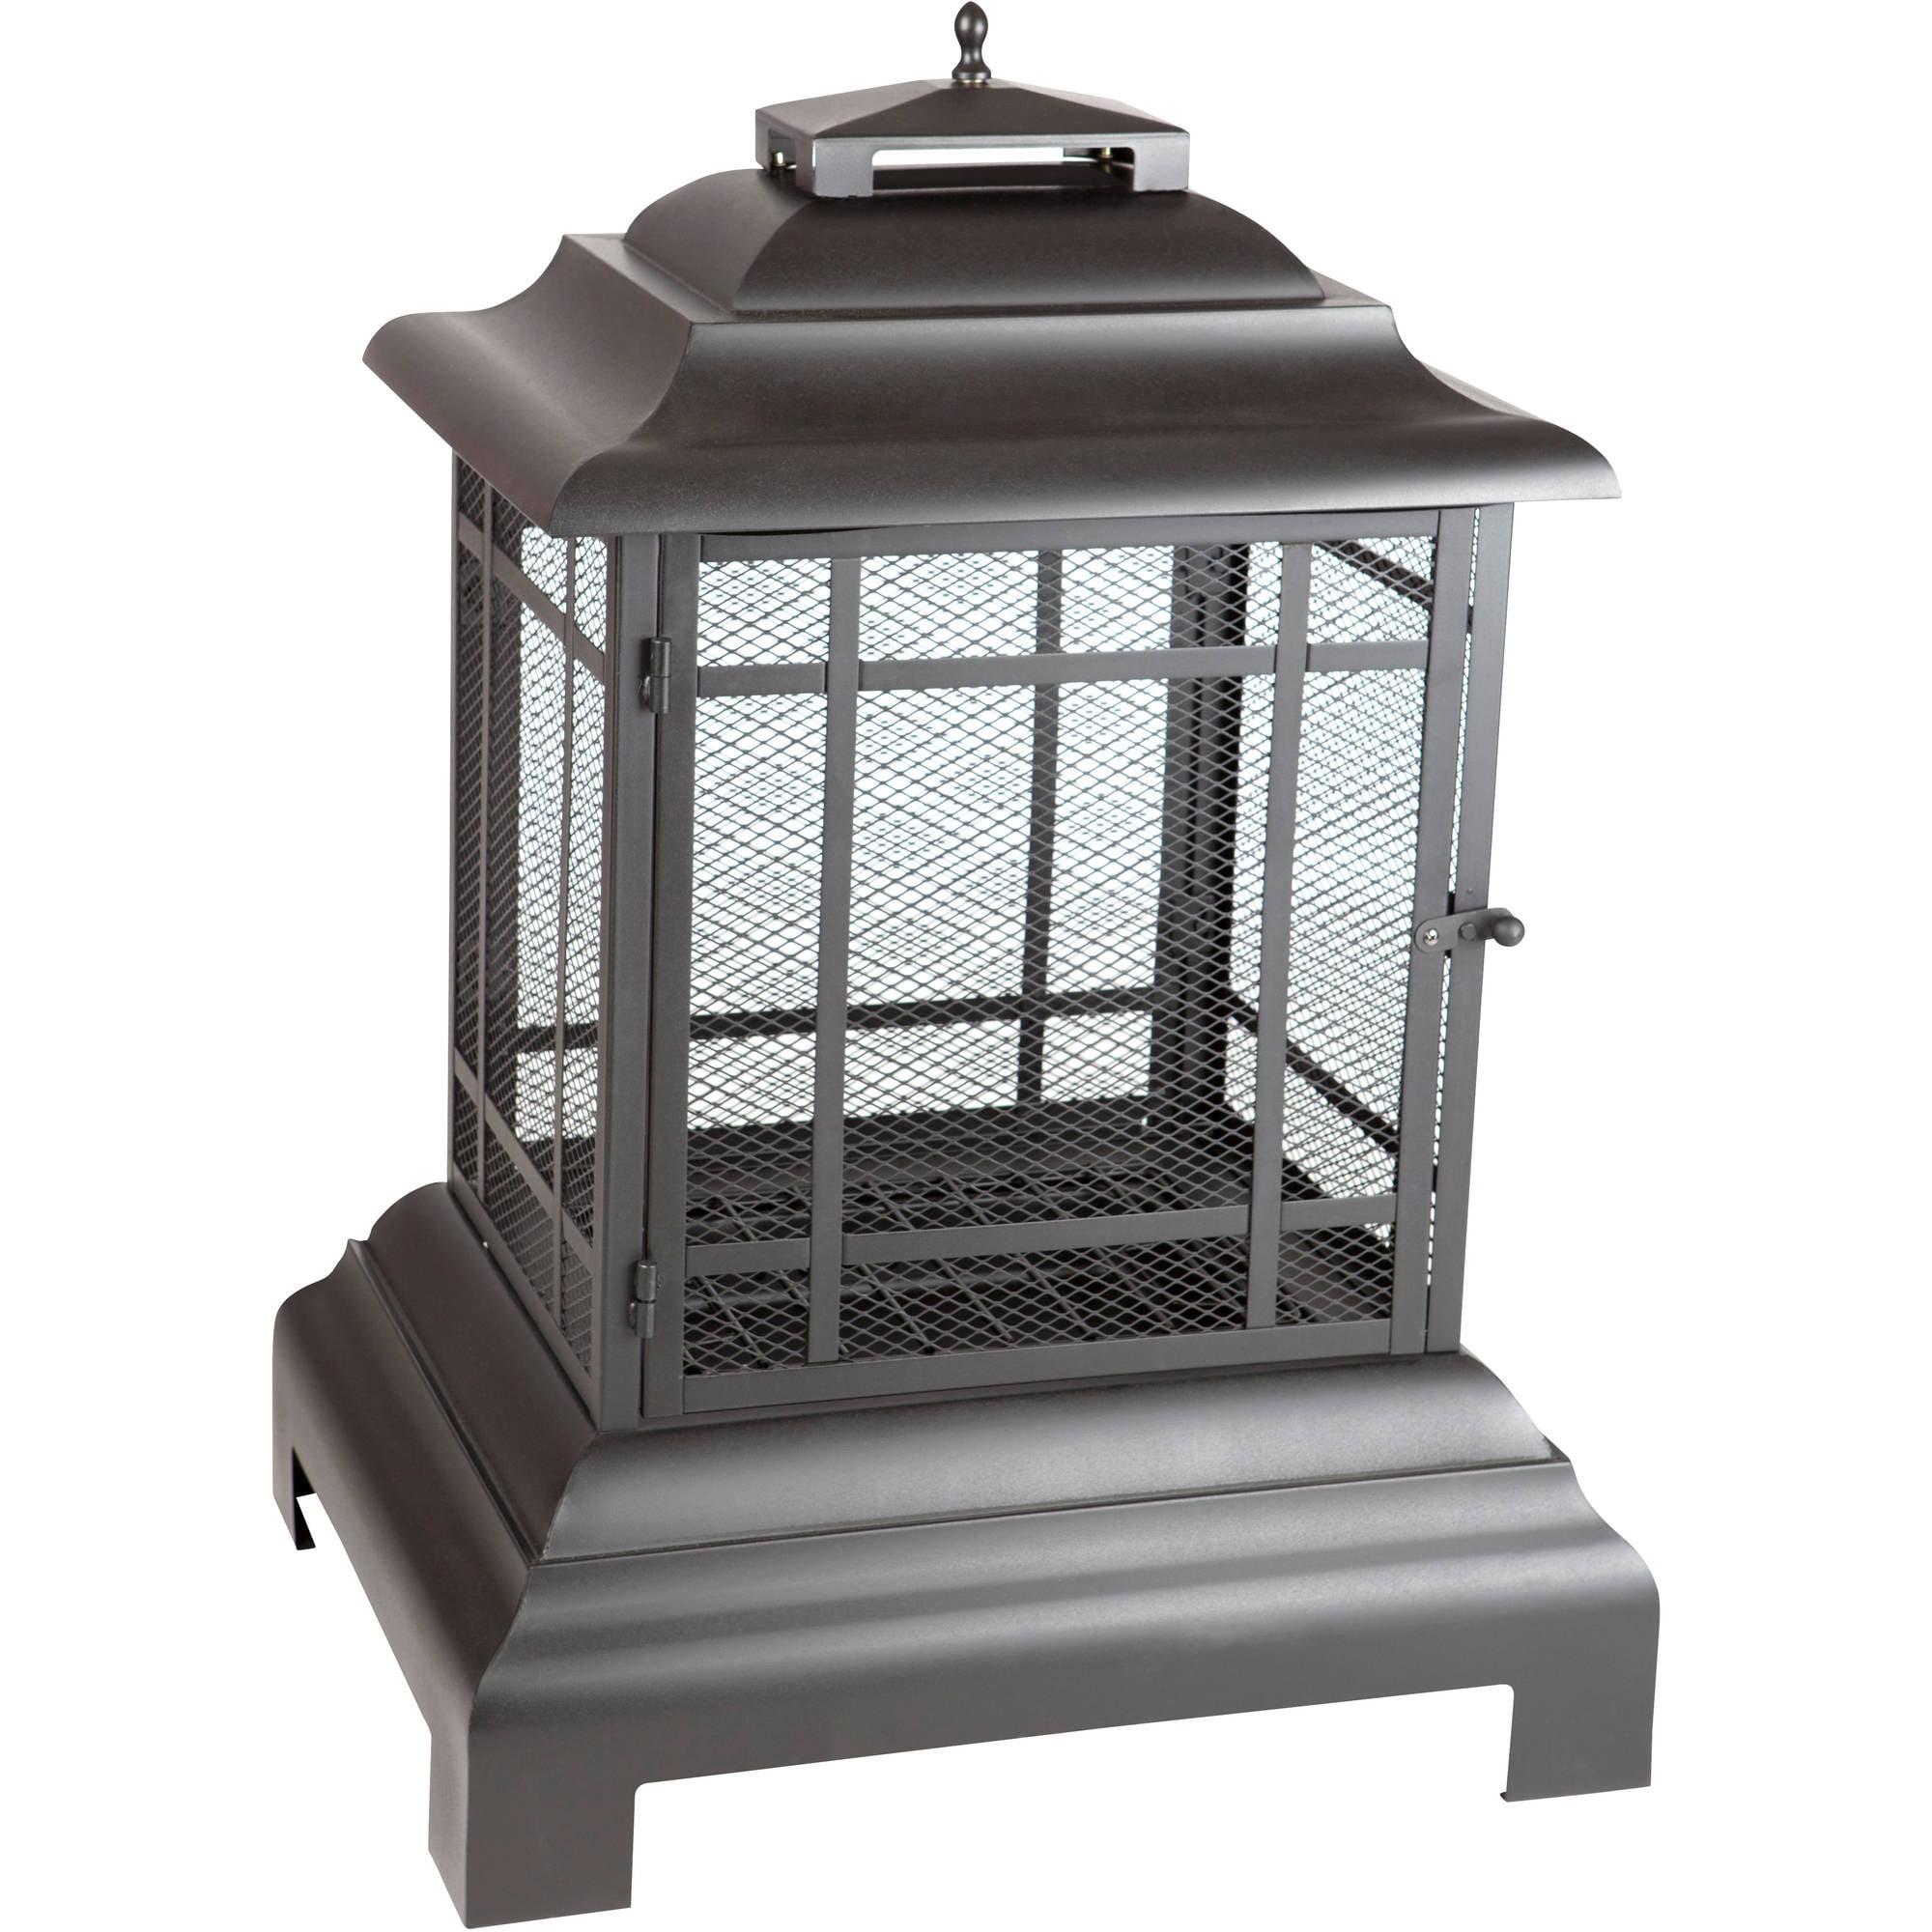 Fire Sense Rectangle Pagoda Patio Fireplace - Walmart.com